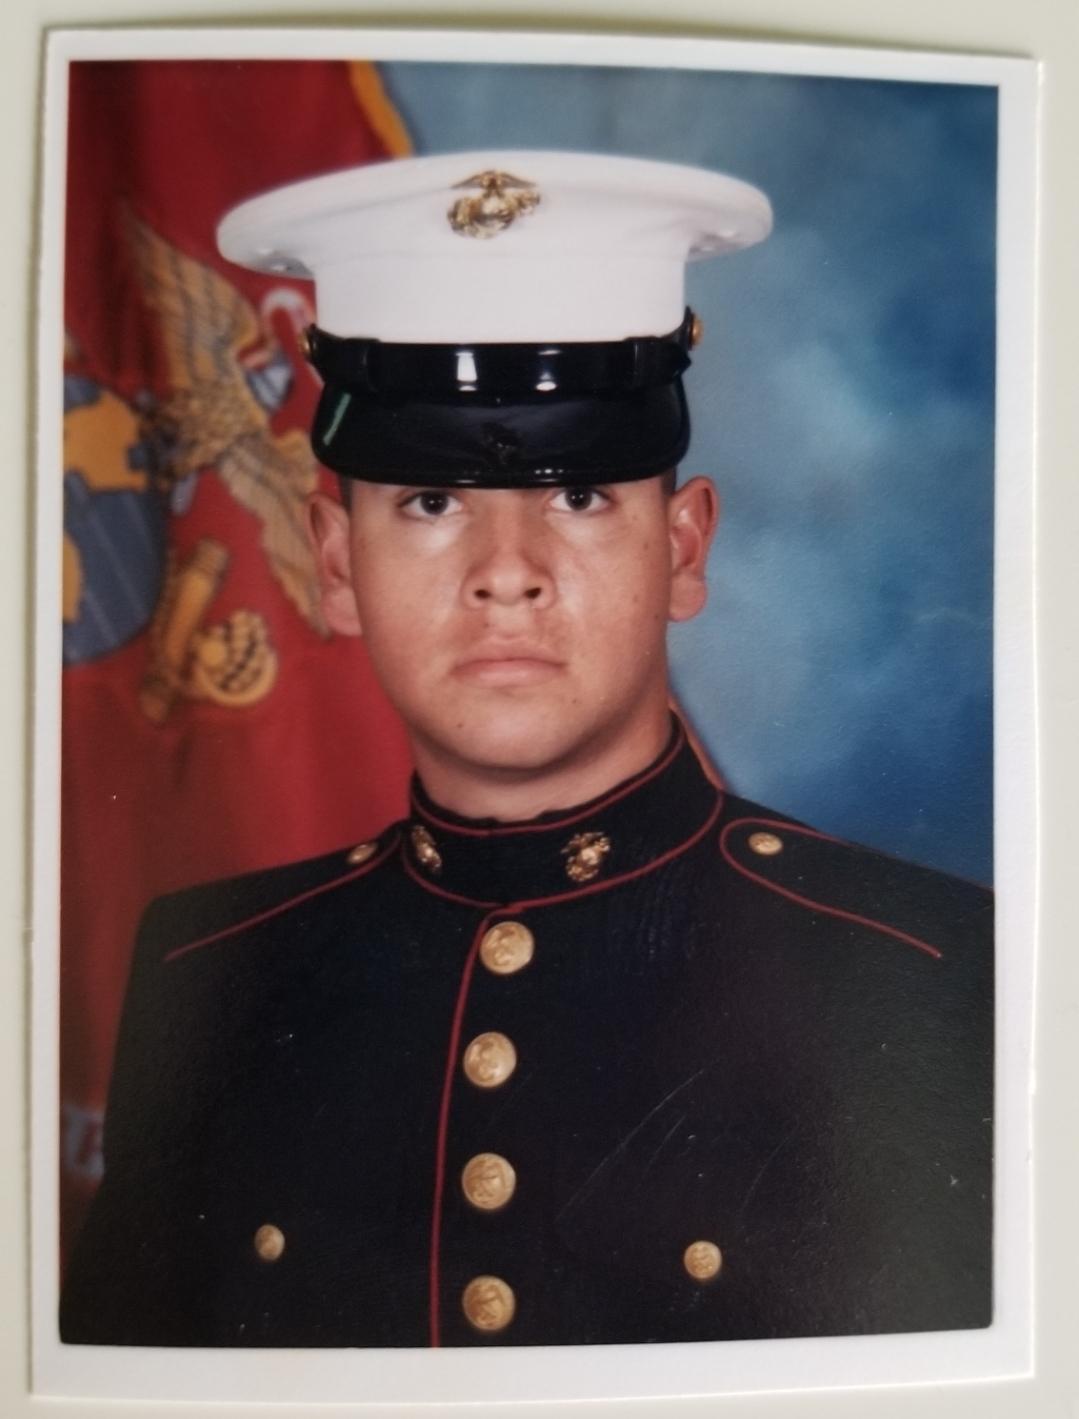 Noel Vargas, Marine Sergeant E-5 (1996-2000)